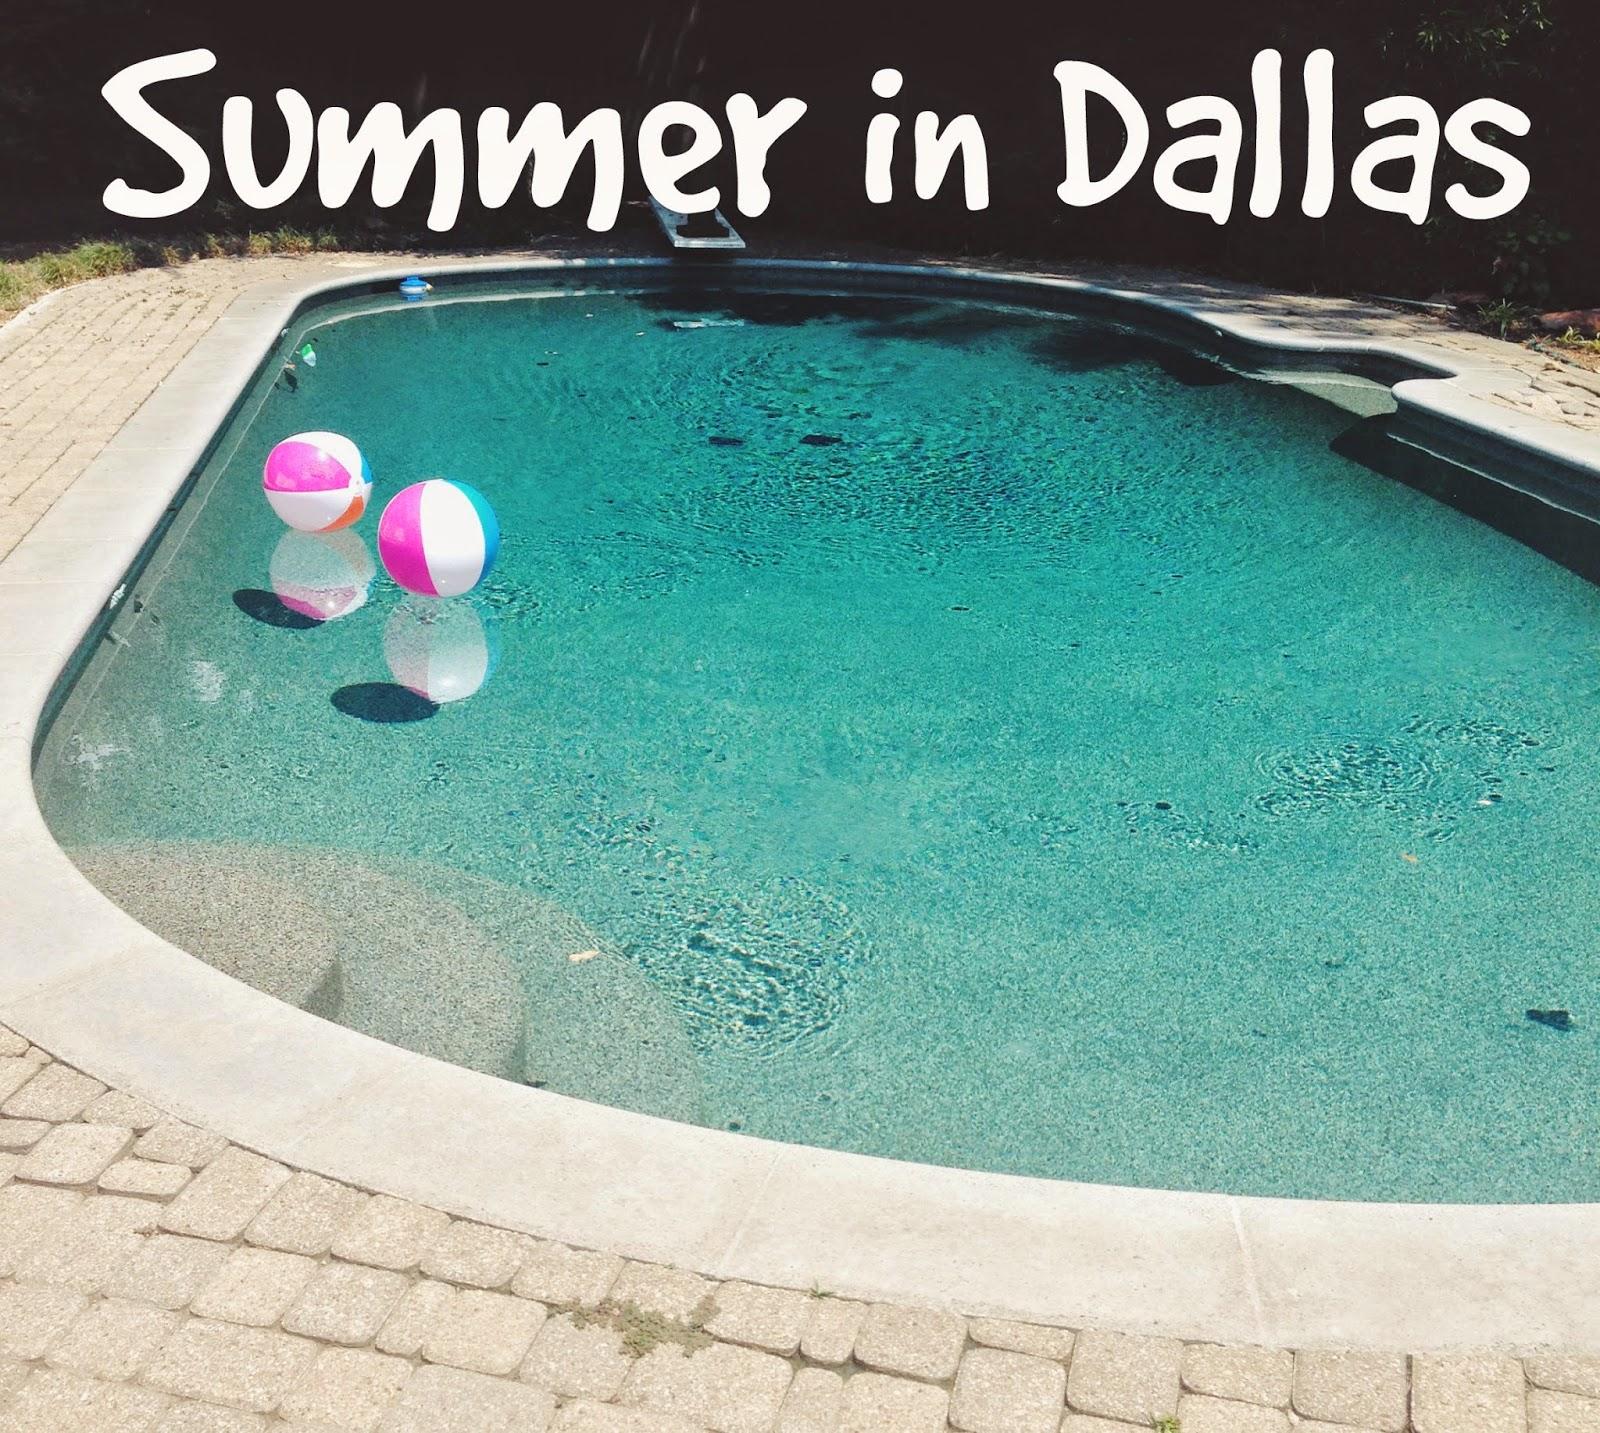 Summer in Dallas